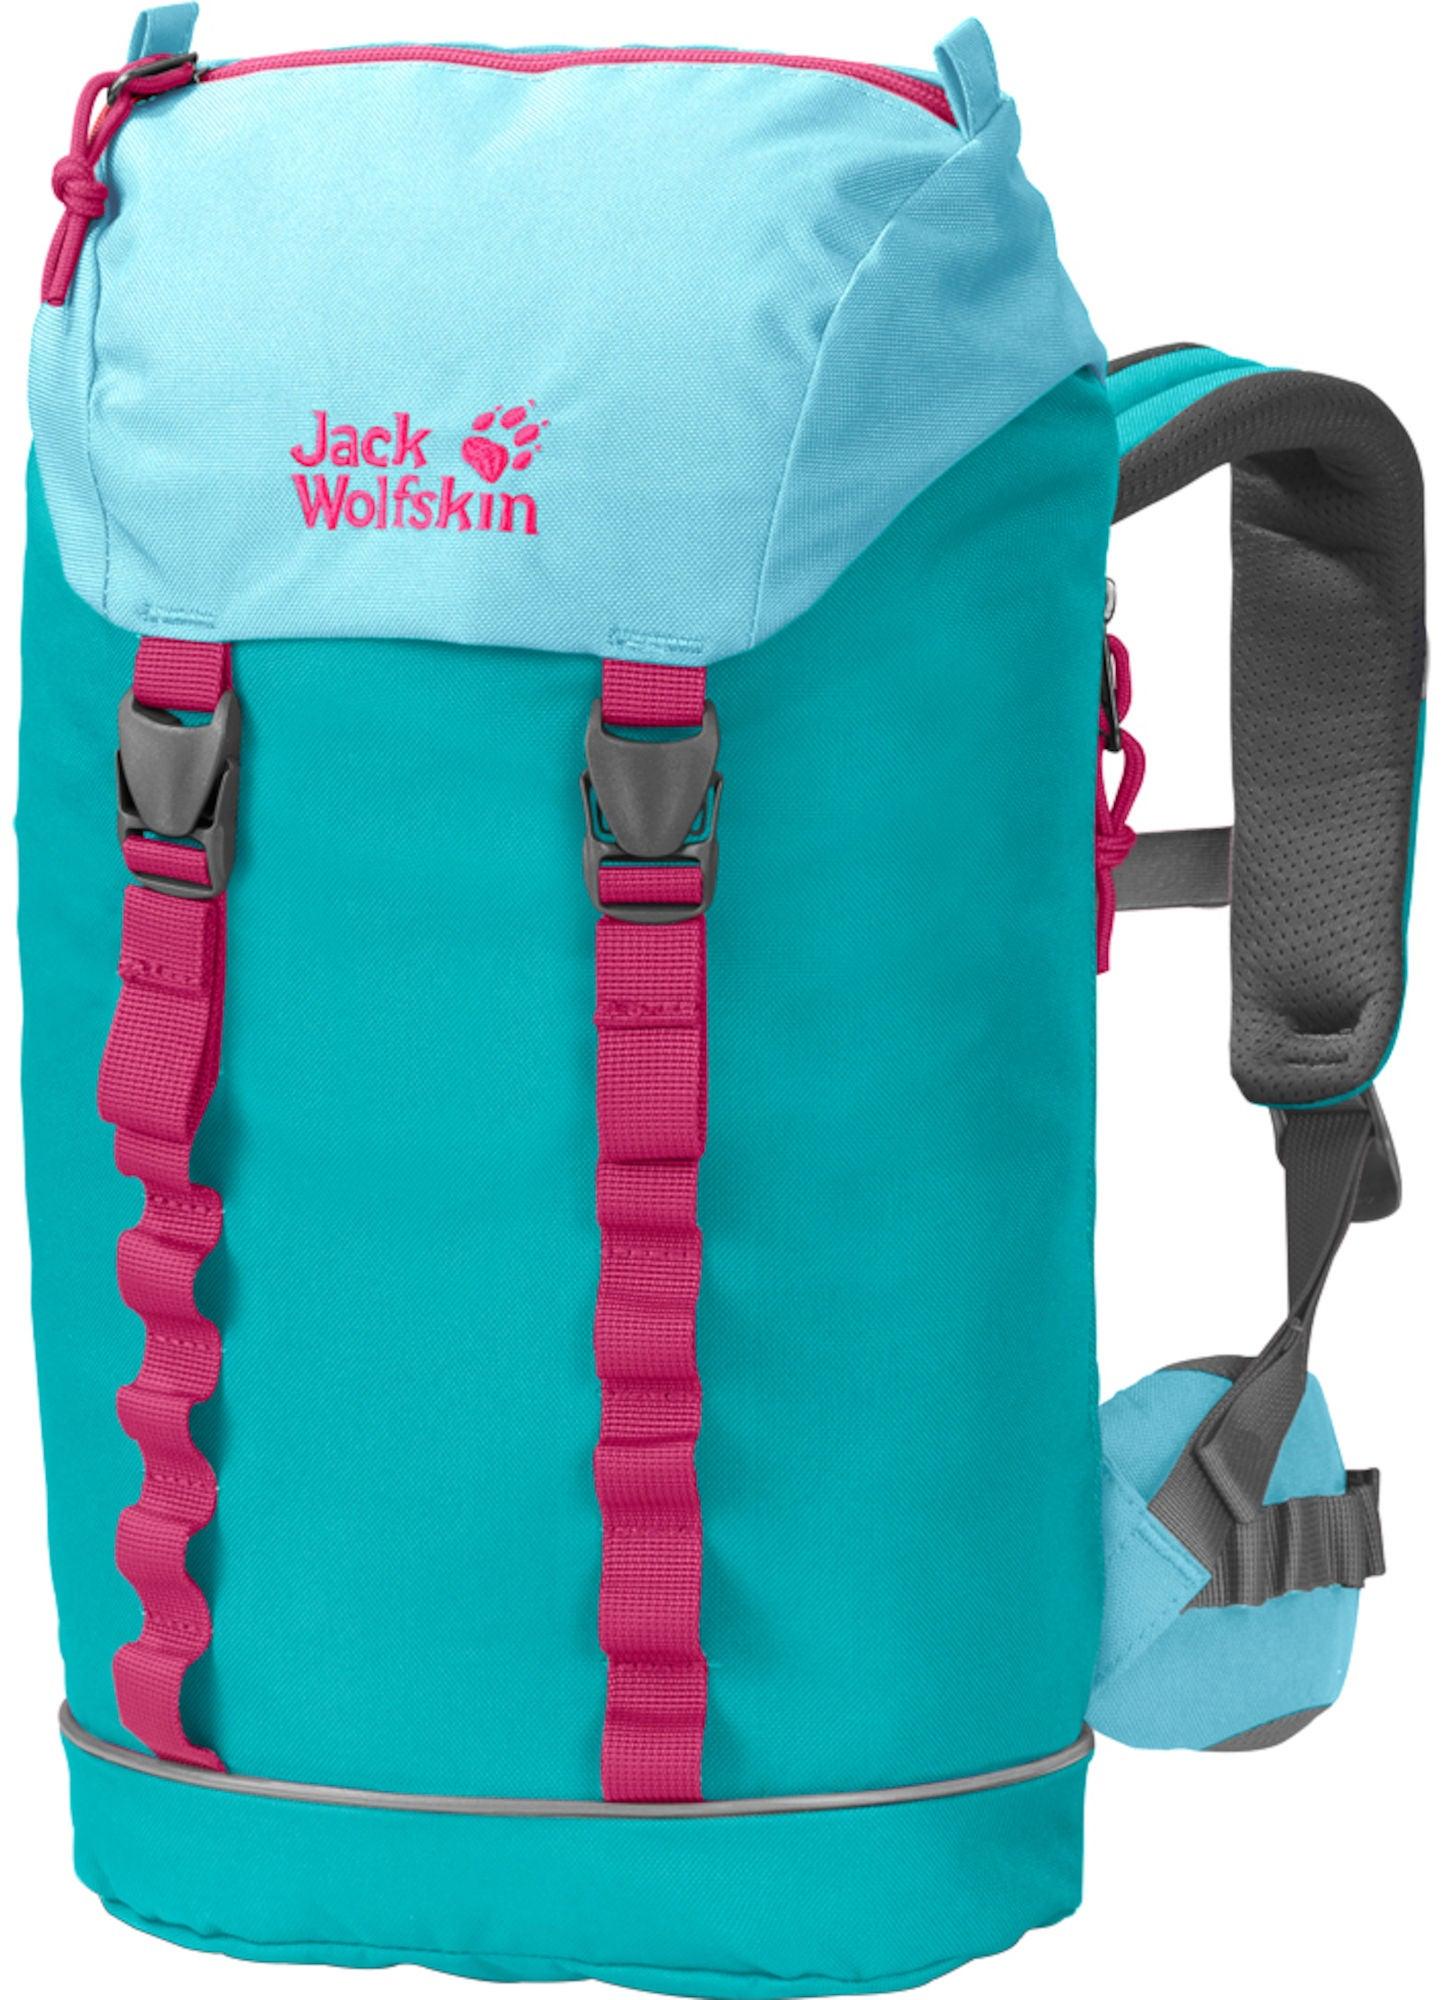 Jack Wolfskin Jungle Gym Ryggsäck, Aquamarine